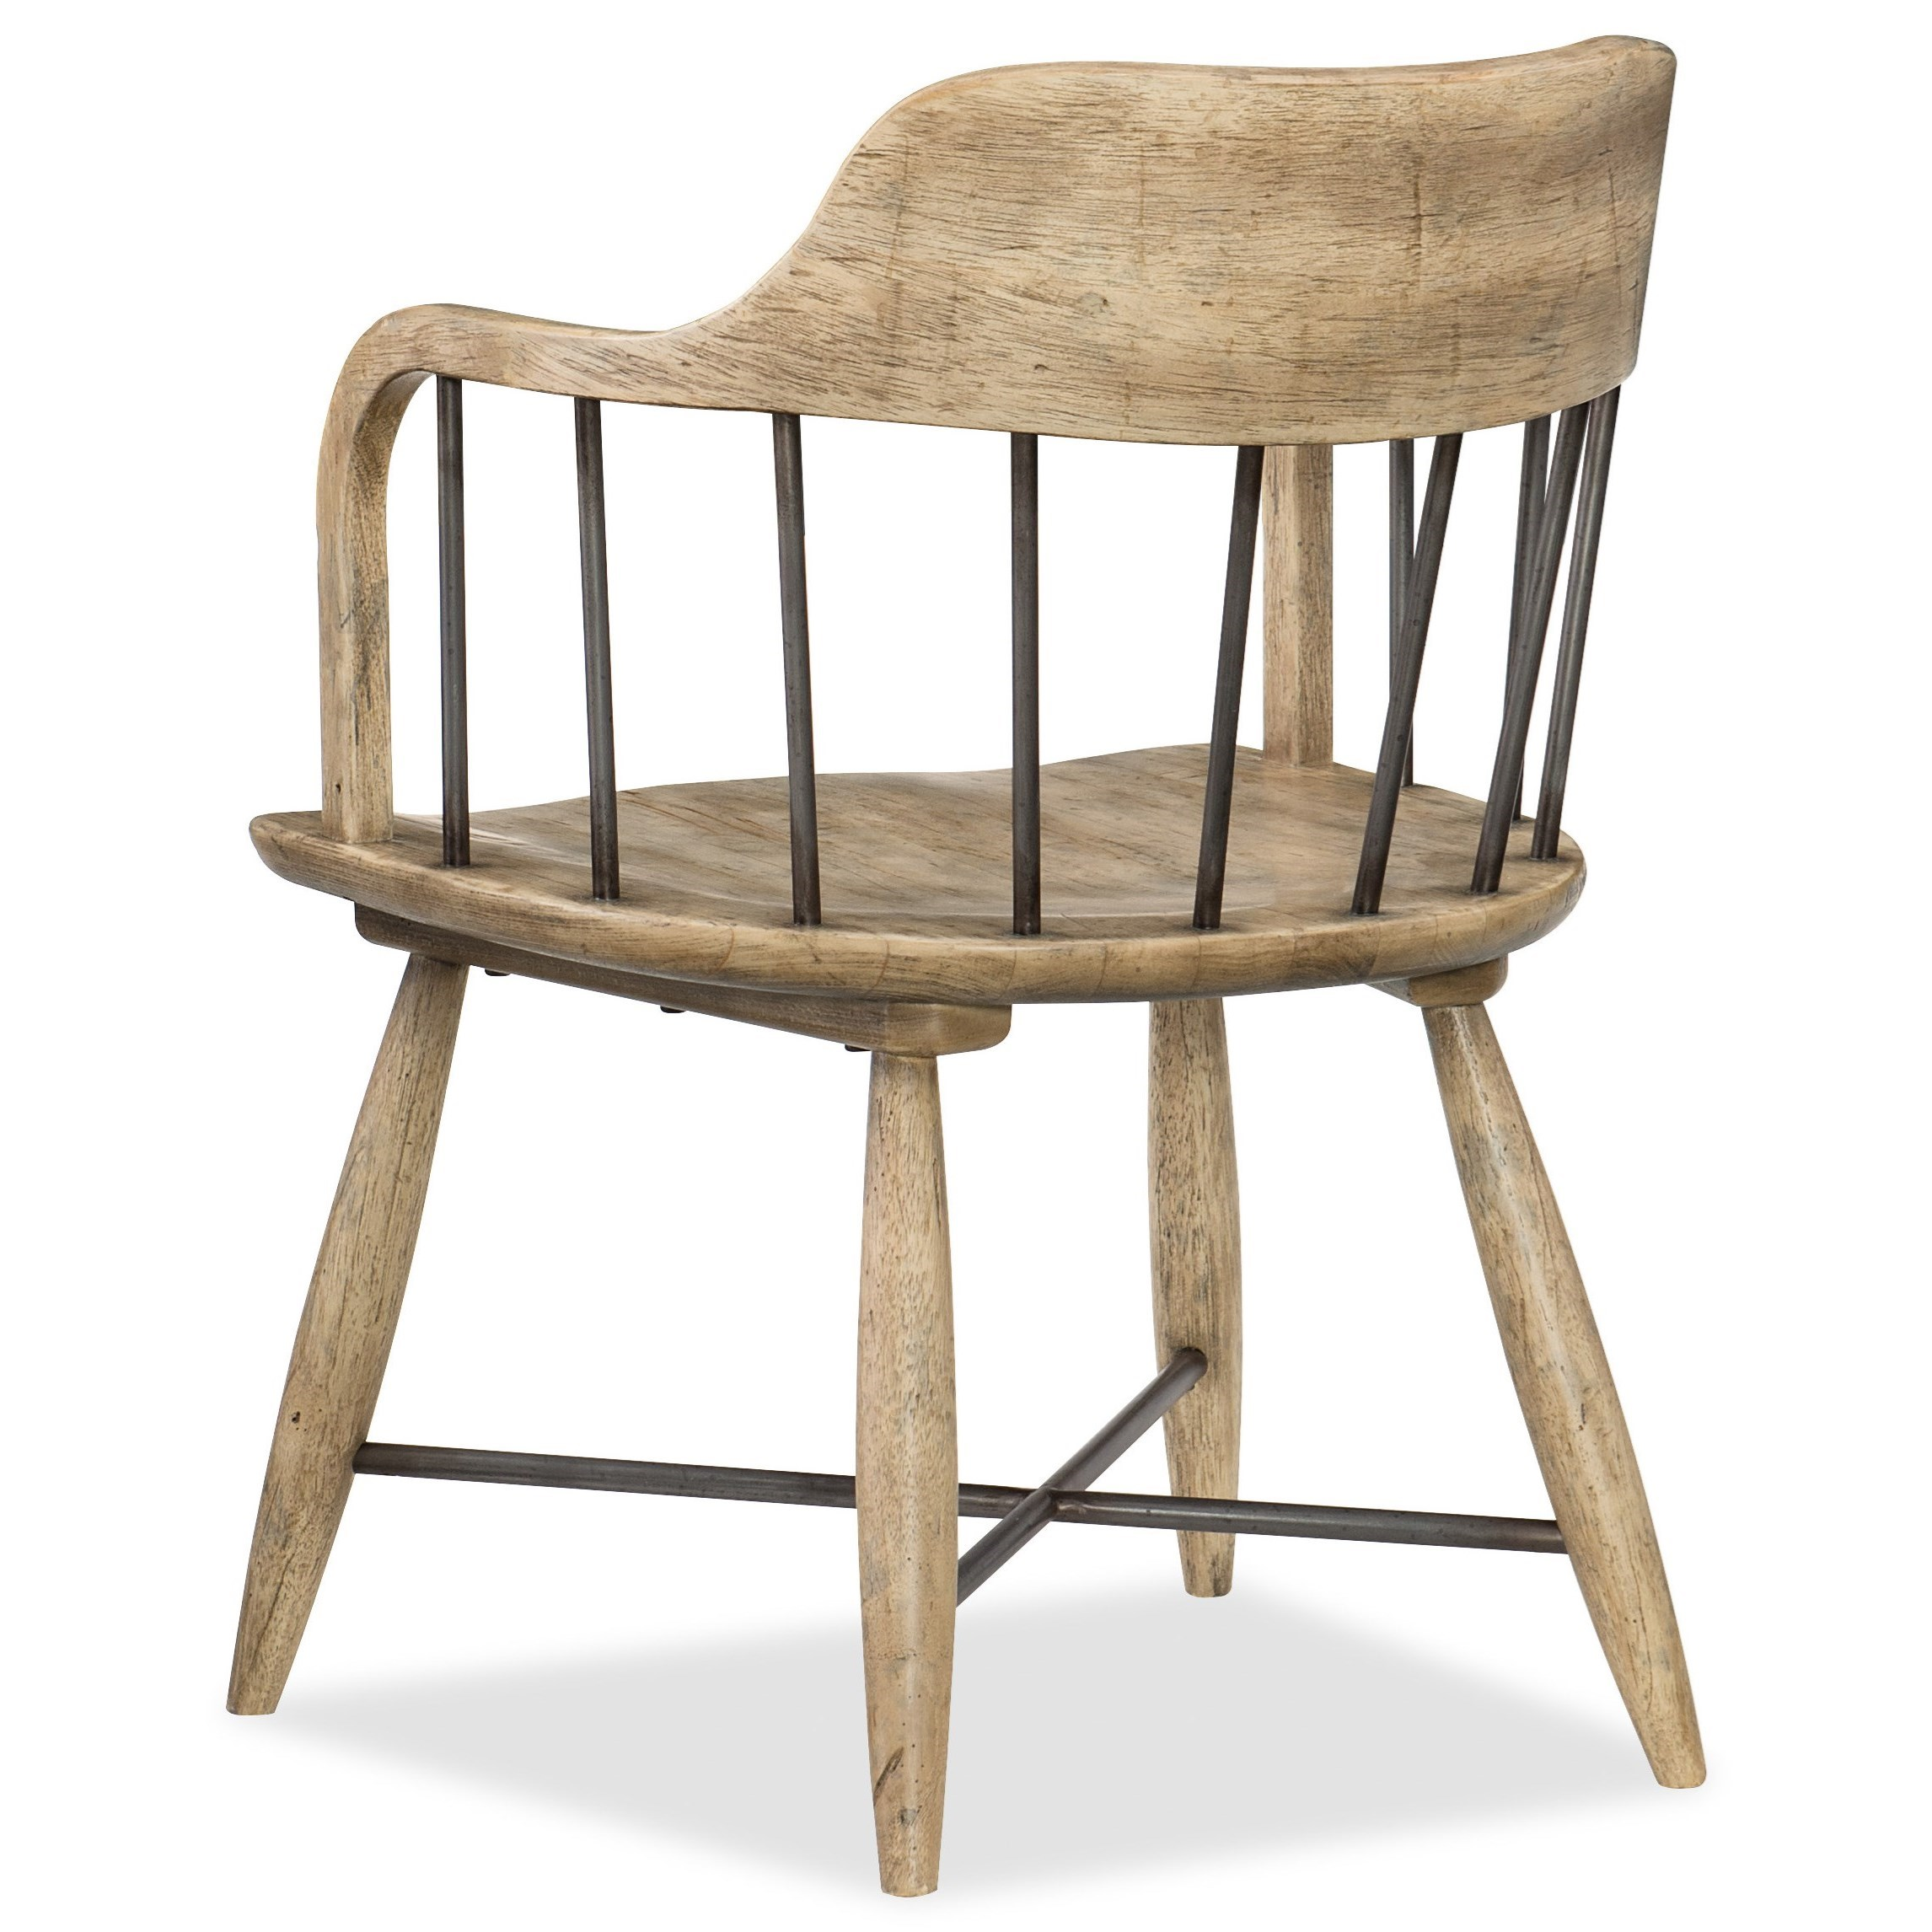 Hooker Furniture American Life Urban Elevation Spindle